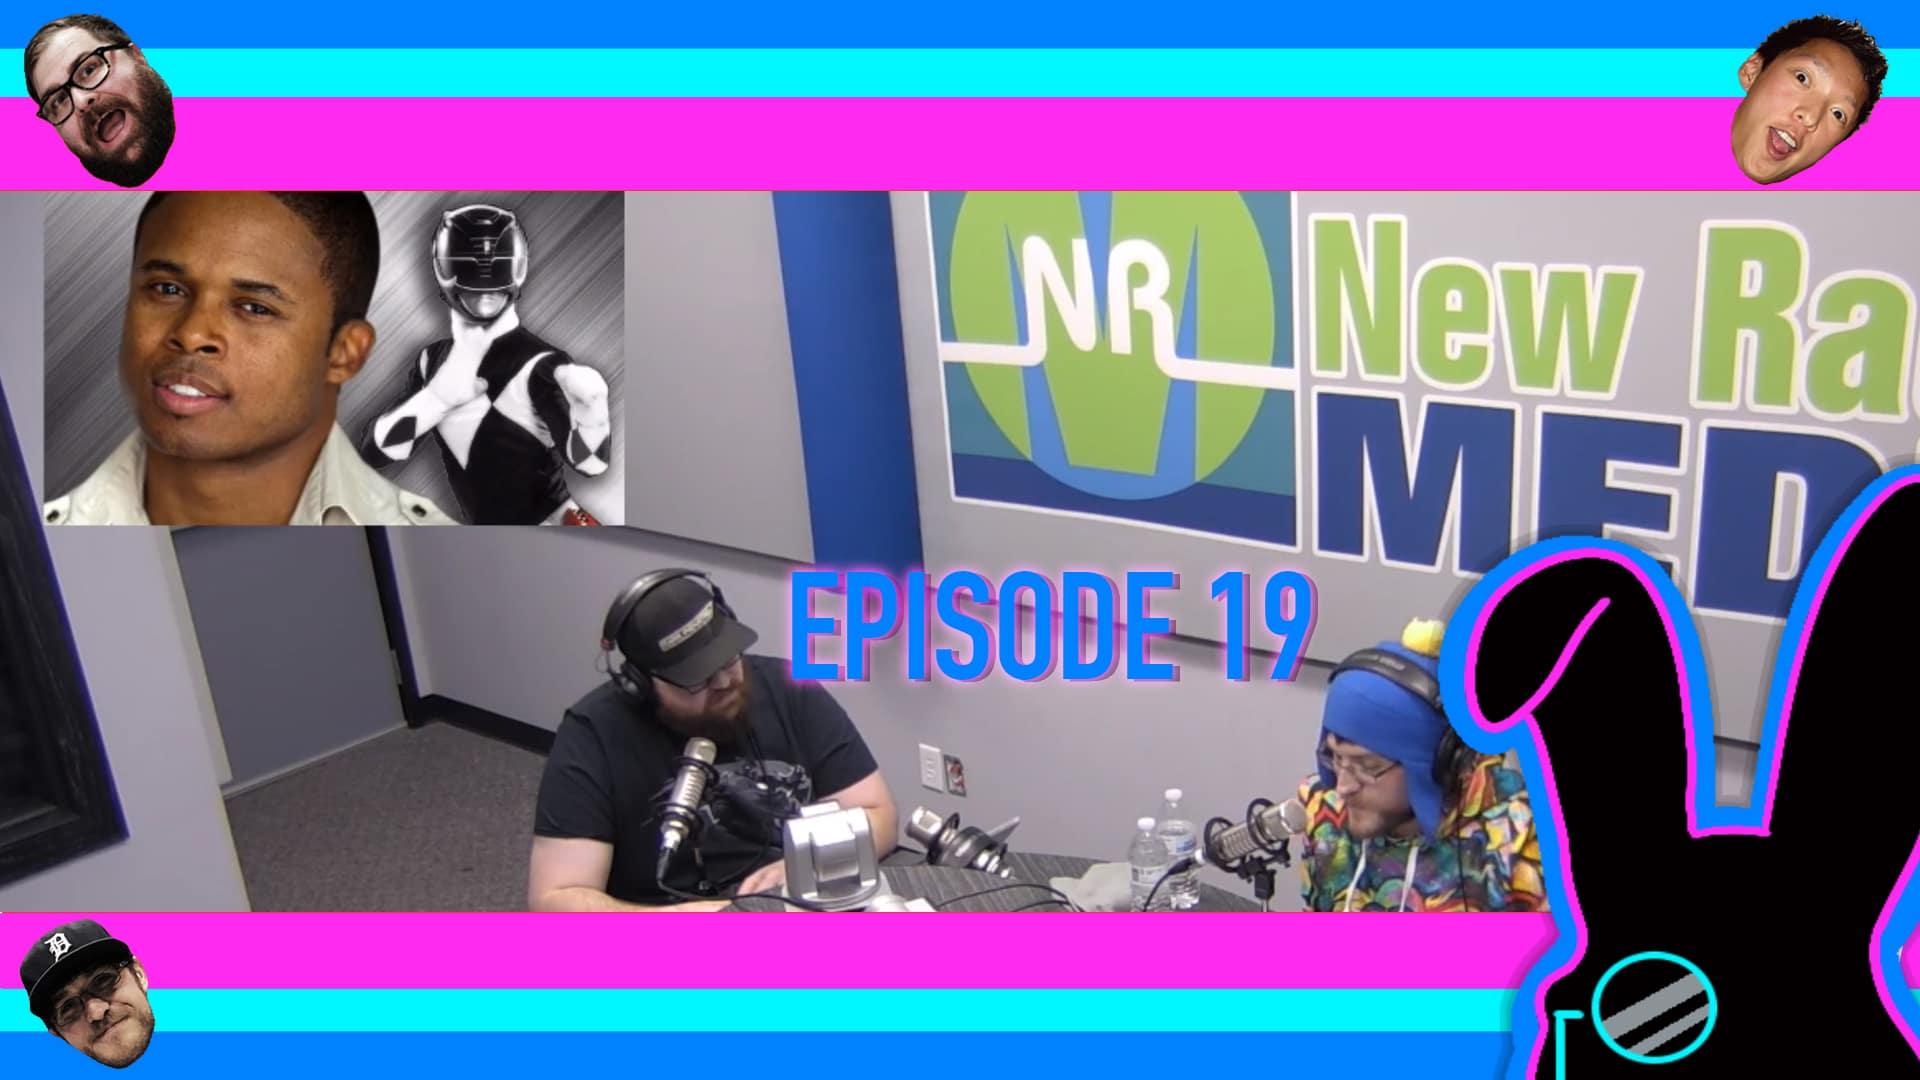 Geektainment Weekly - Episode 19